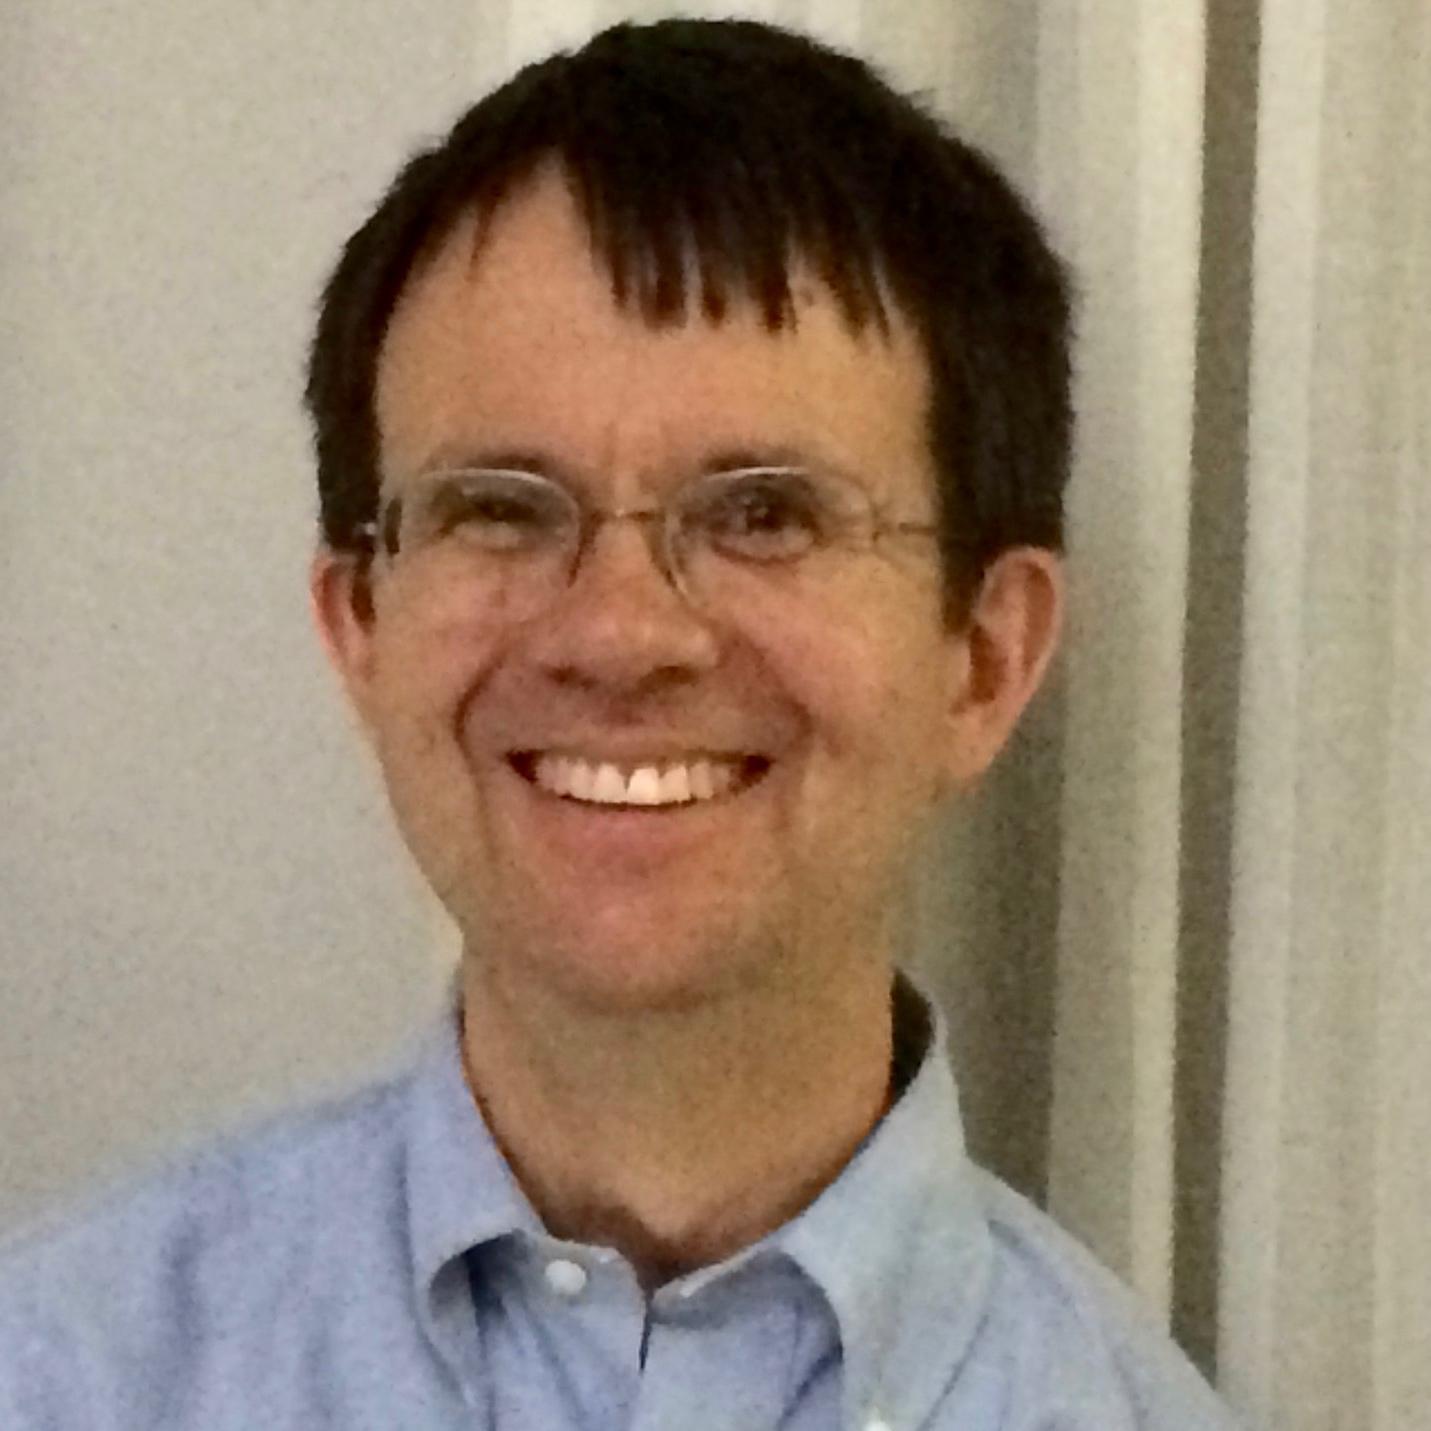 image of Eric Allin Cornell